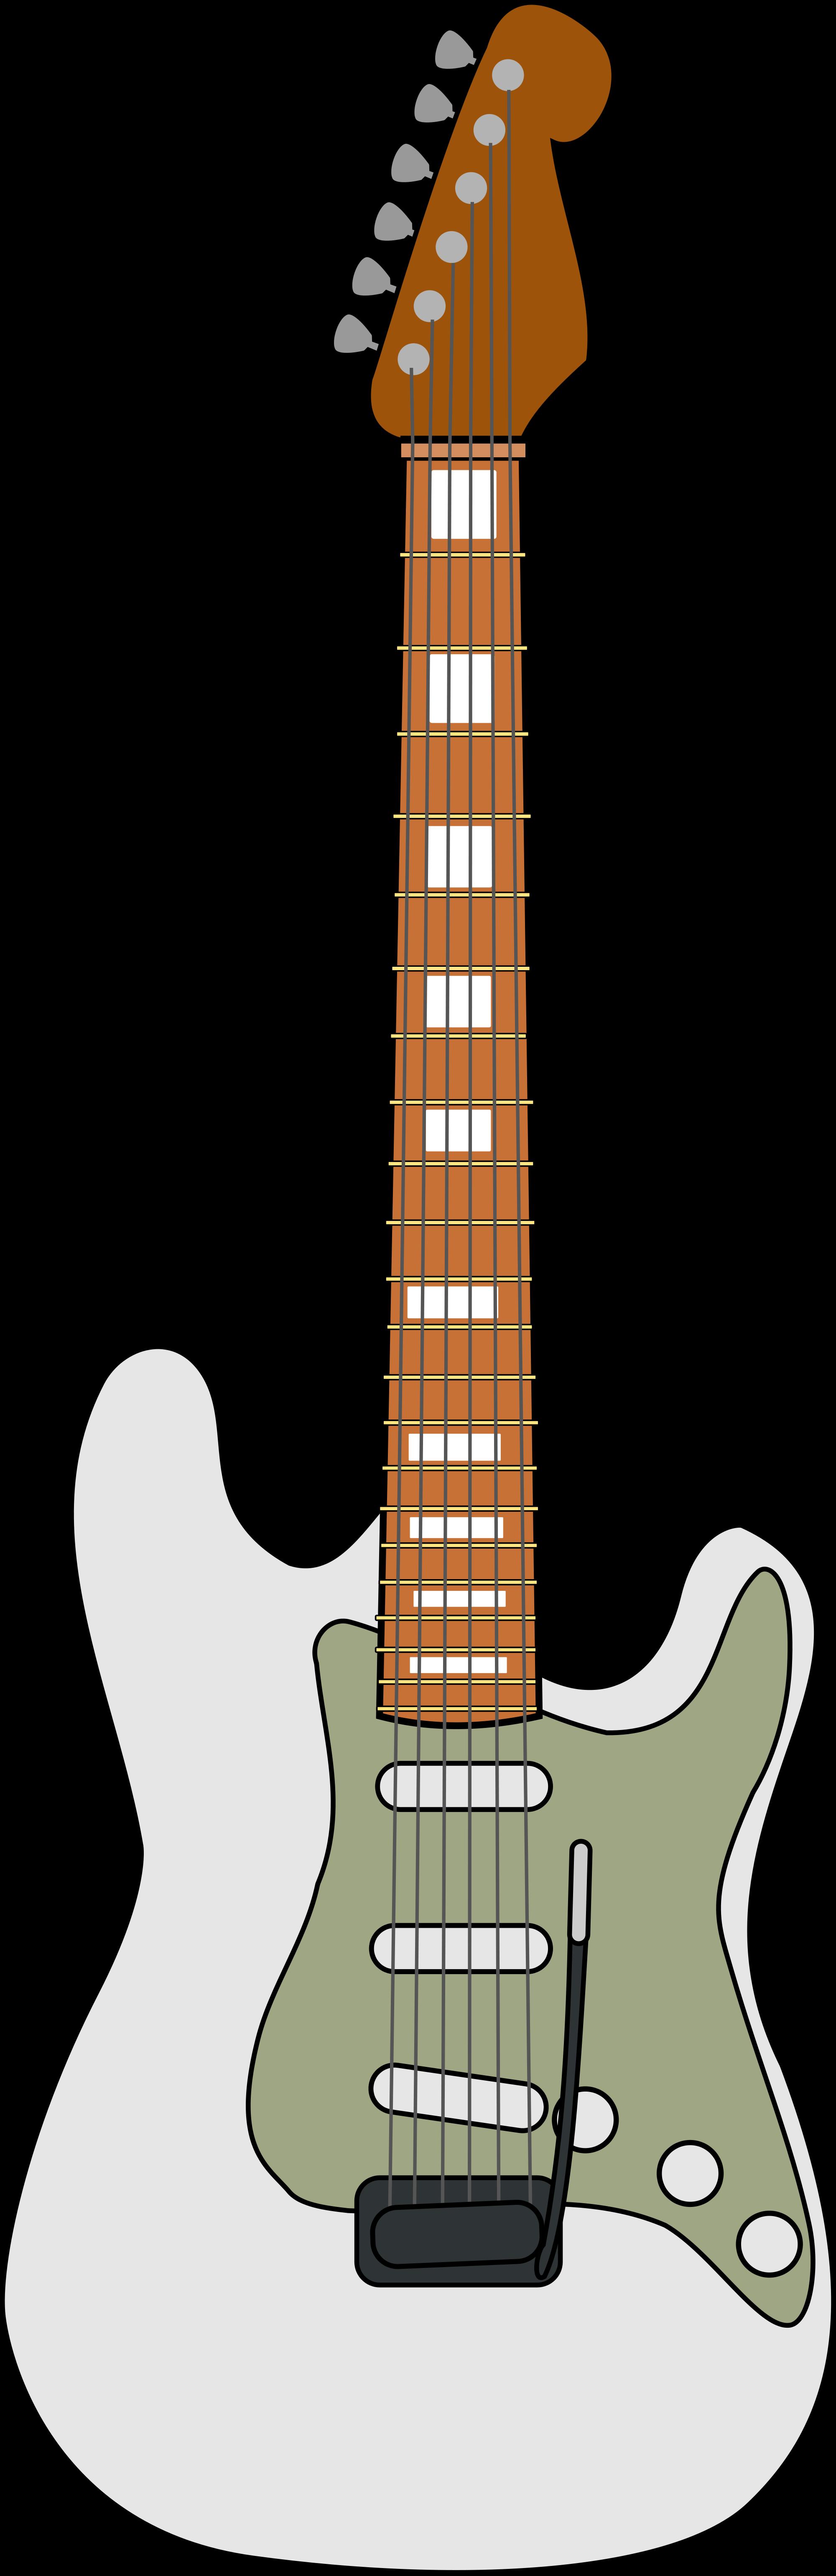 Clipart guitar svg. File fender stratocaster wikimedia